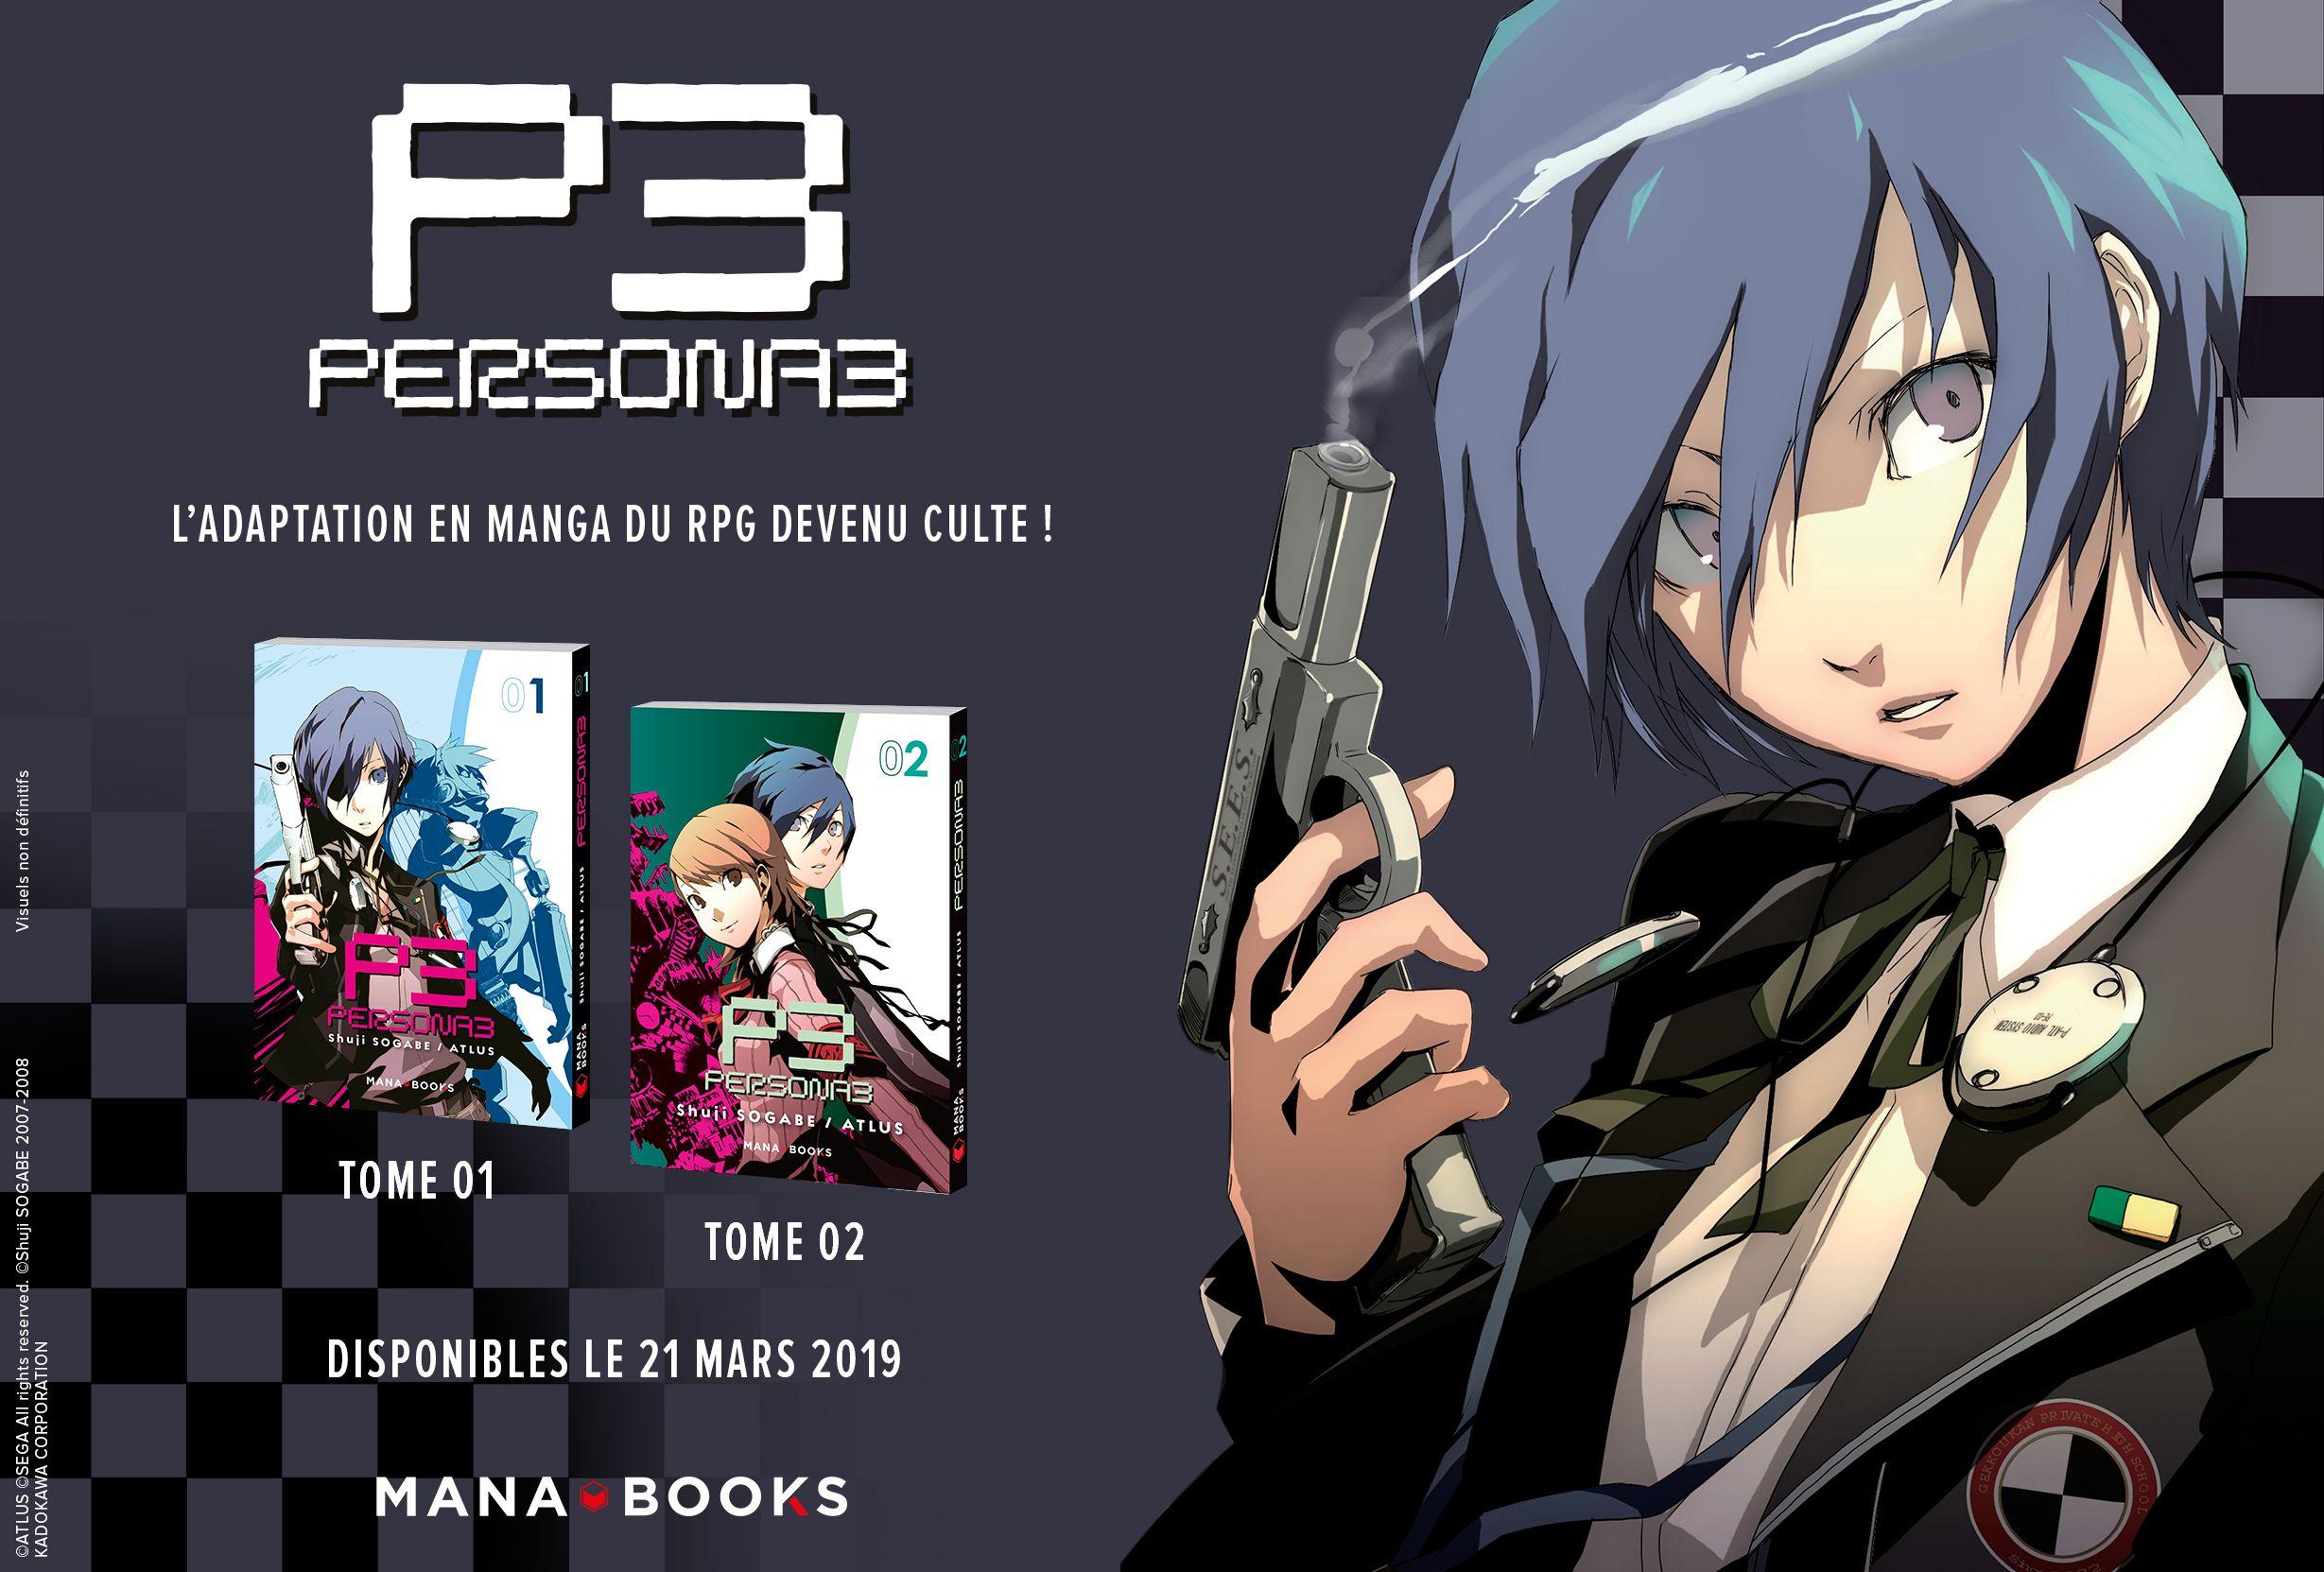 Persona3 manga annonce